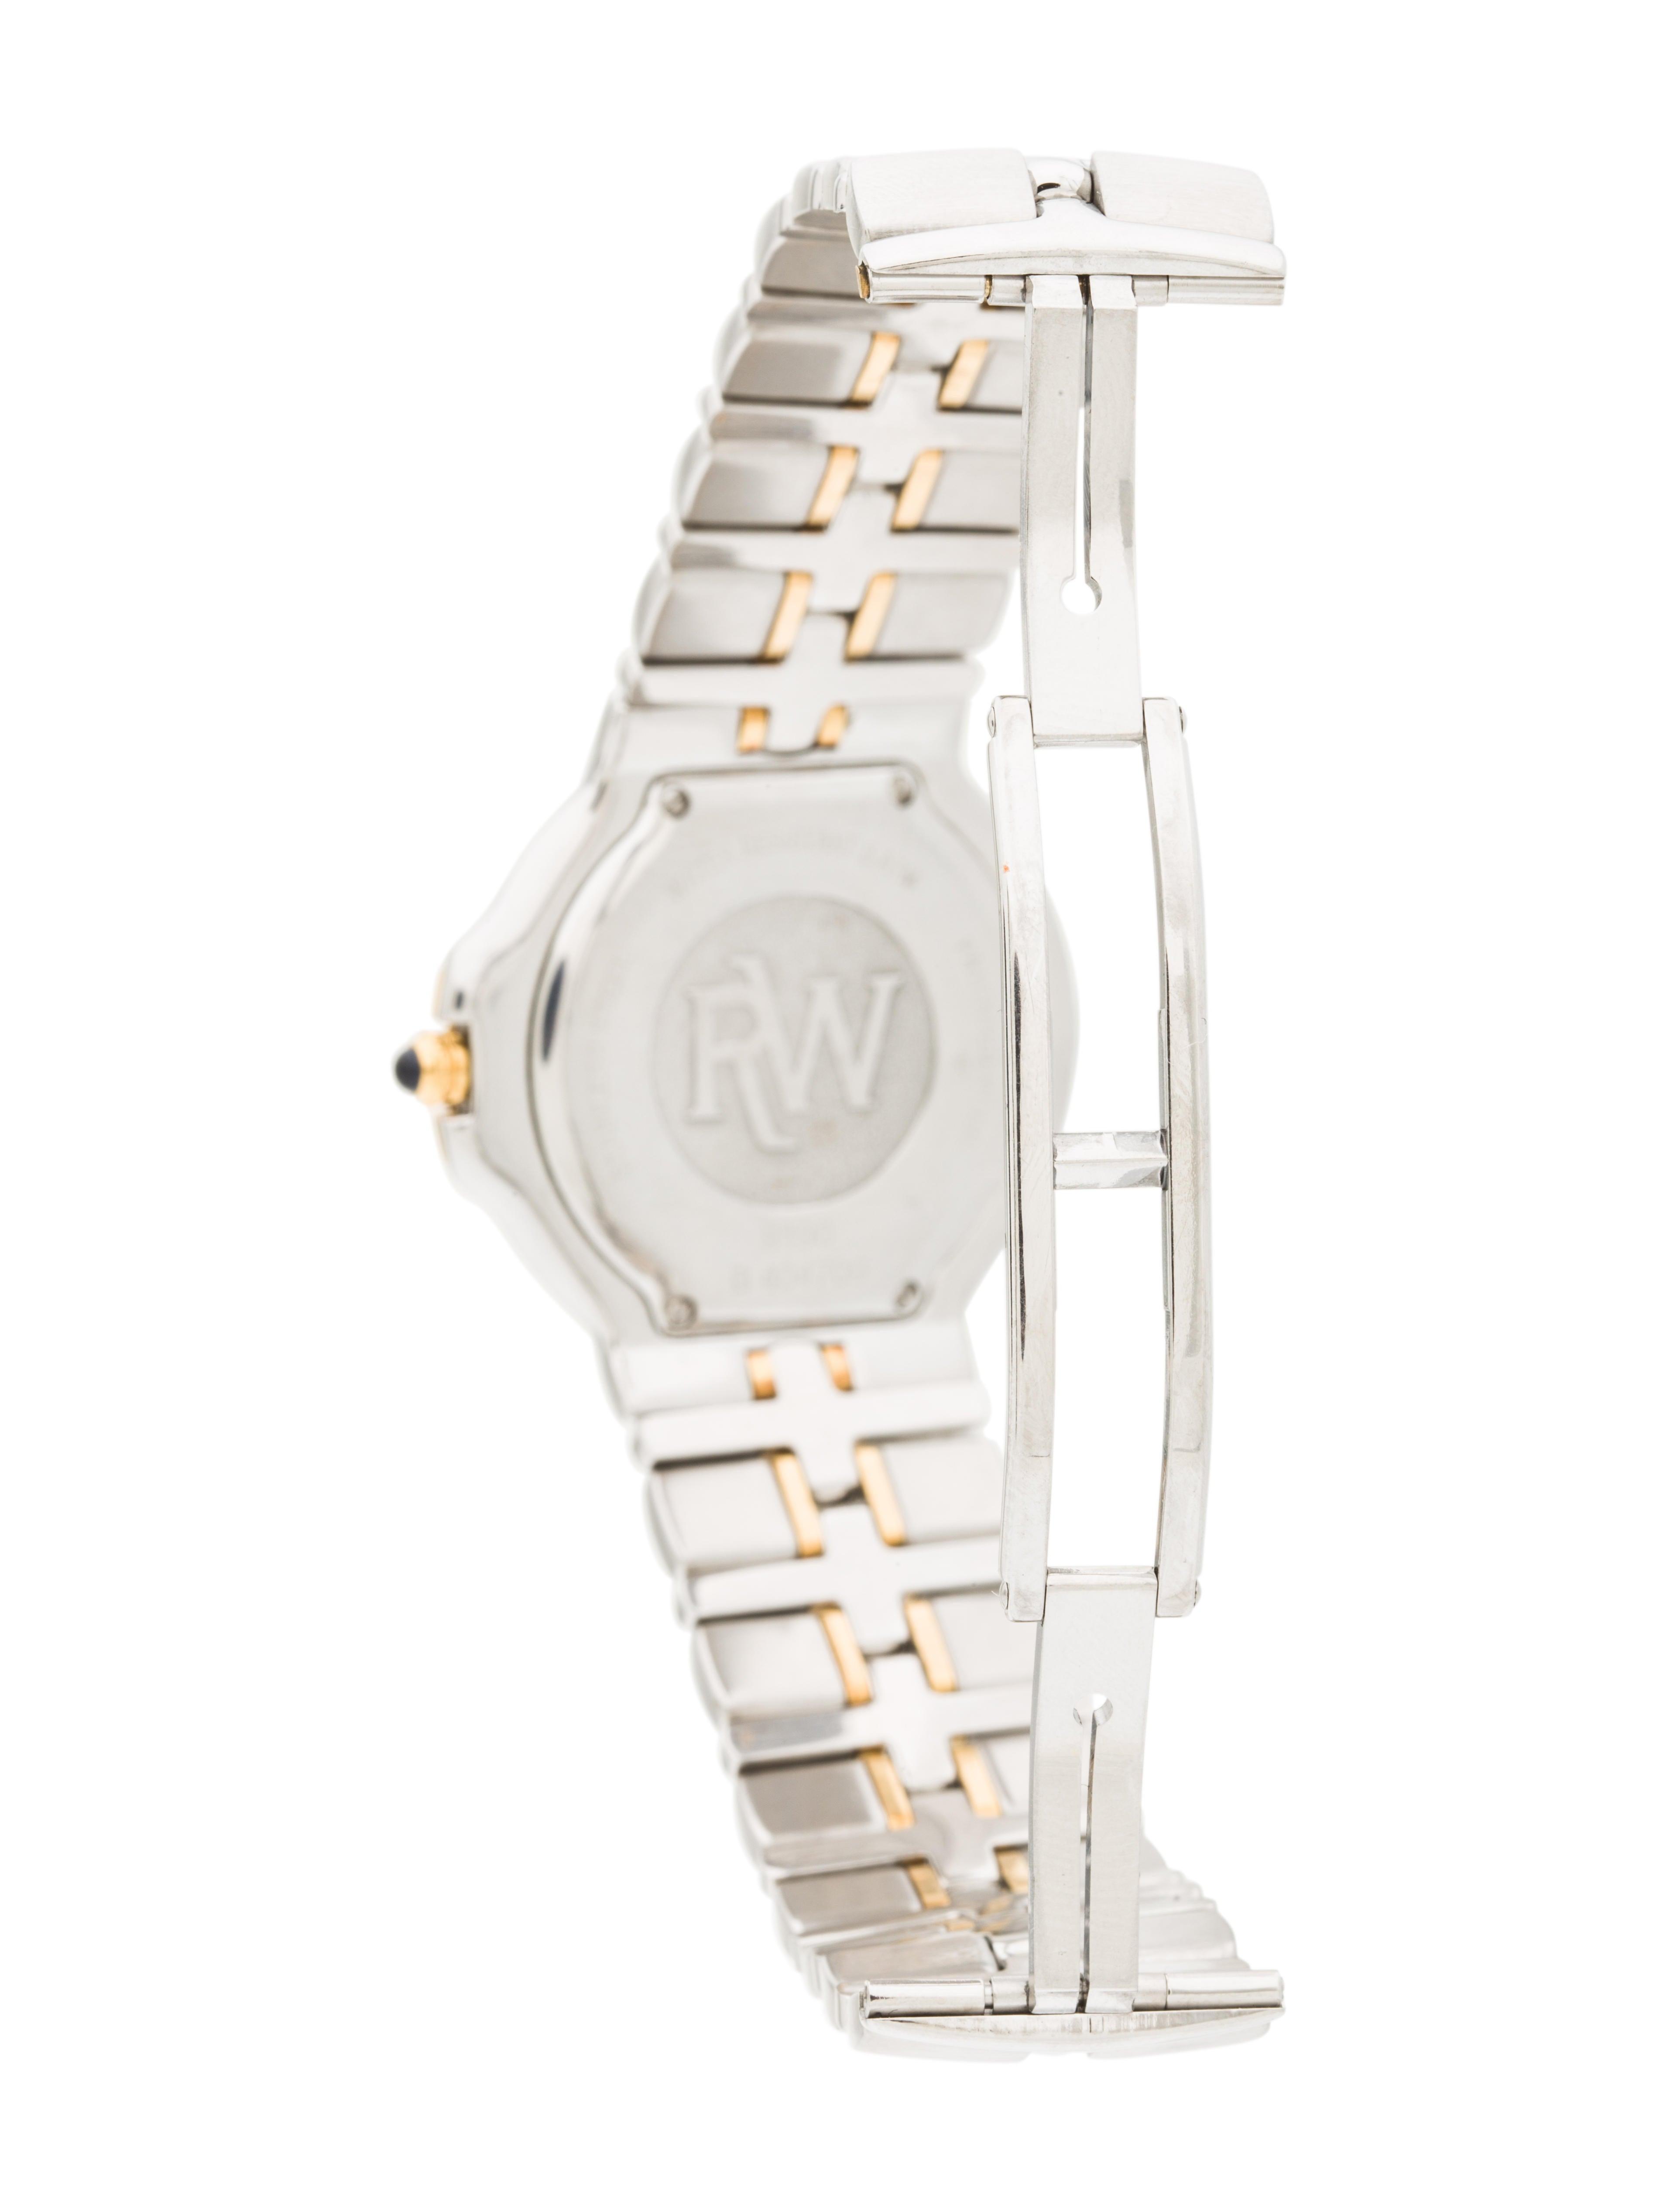 raymond weil watch parsifal | eBay